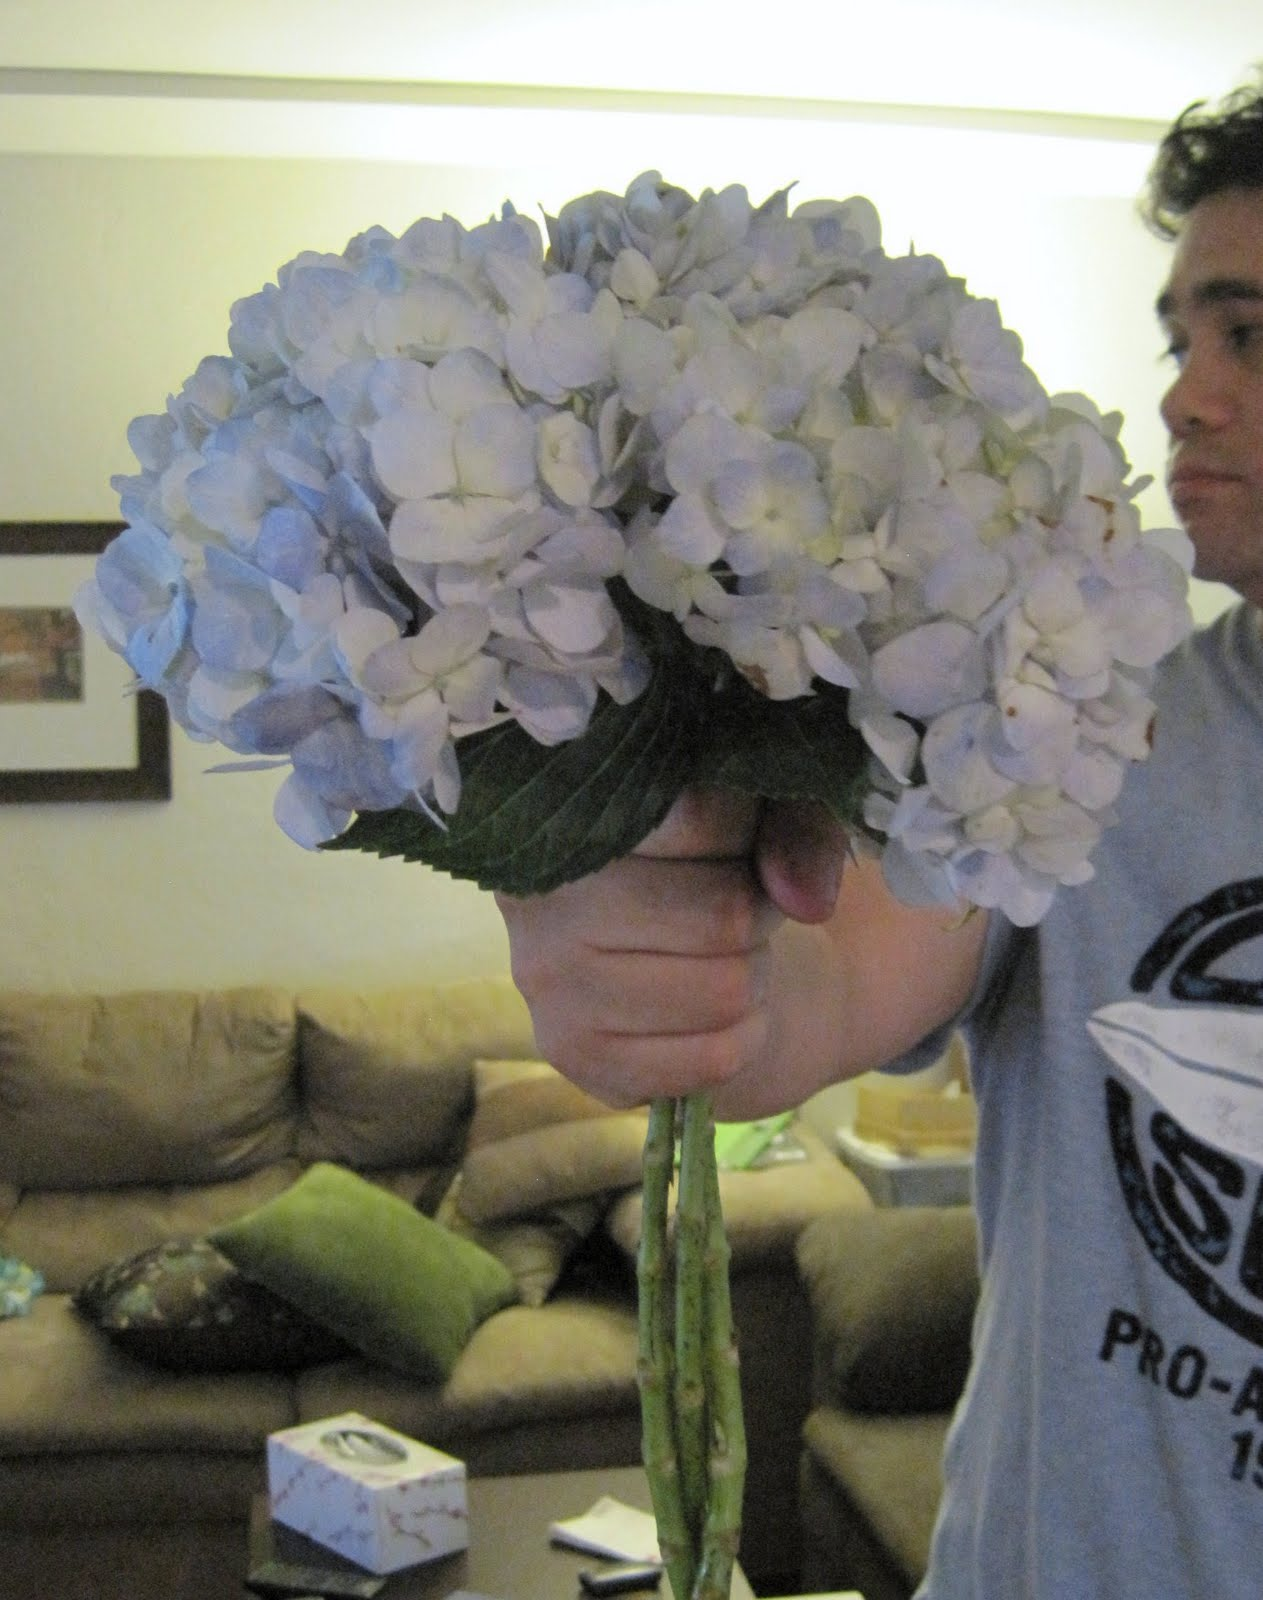 High tide or low wedding flowers take